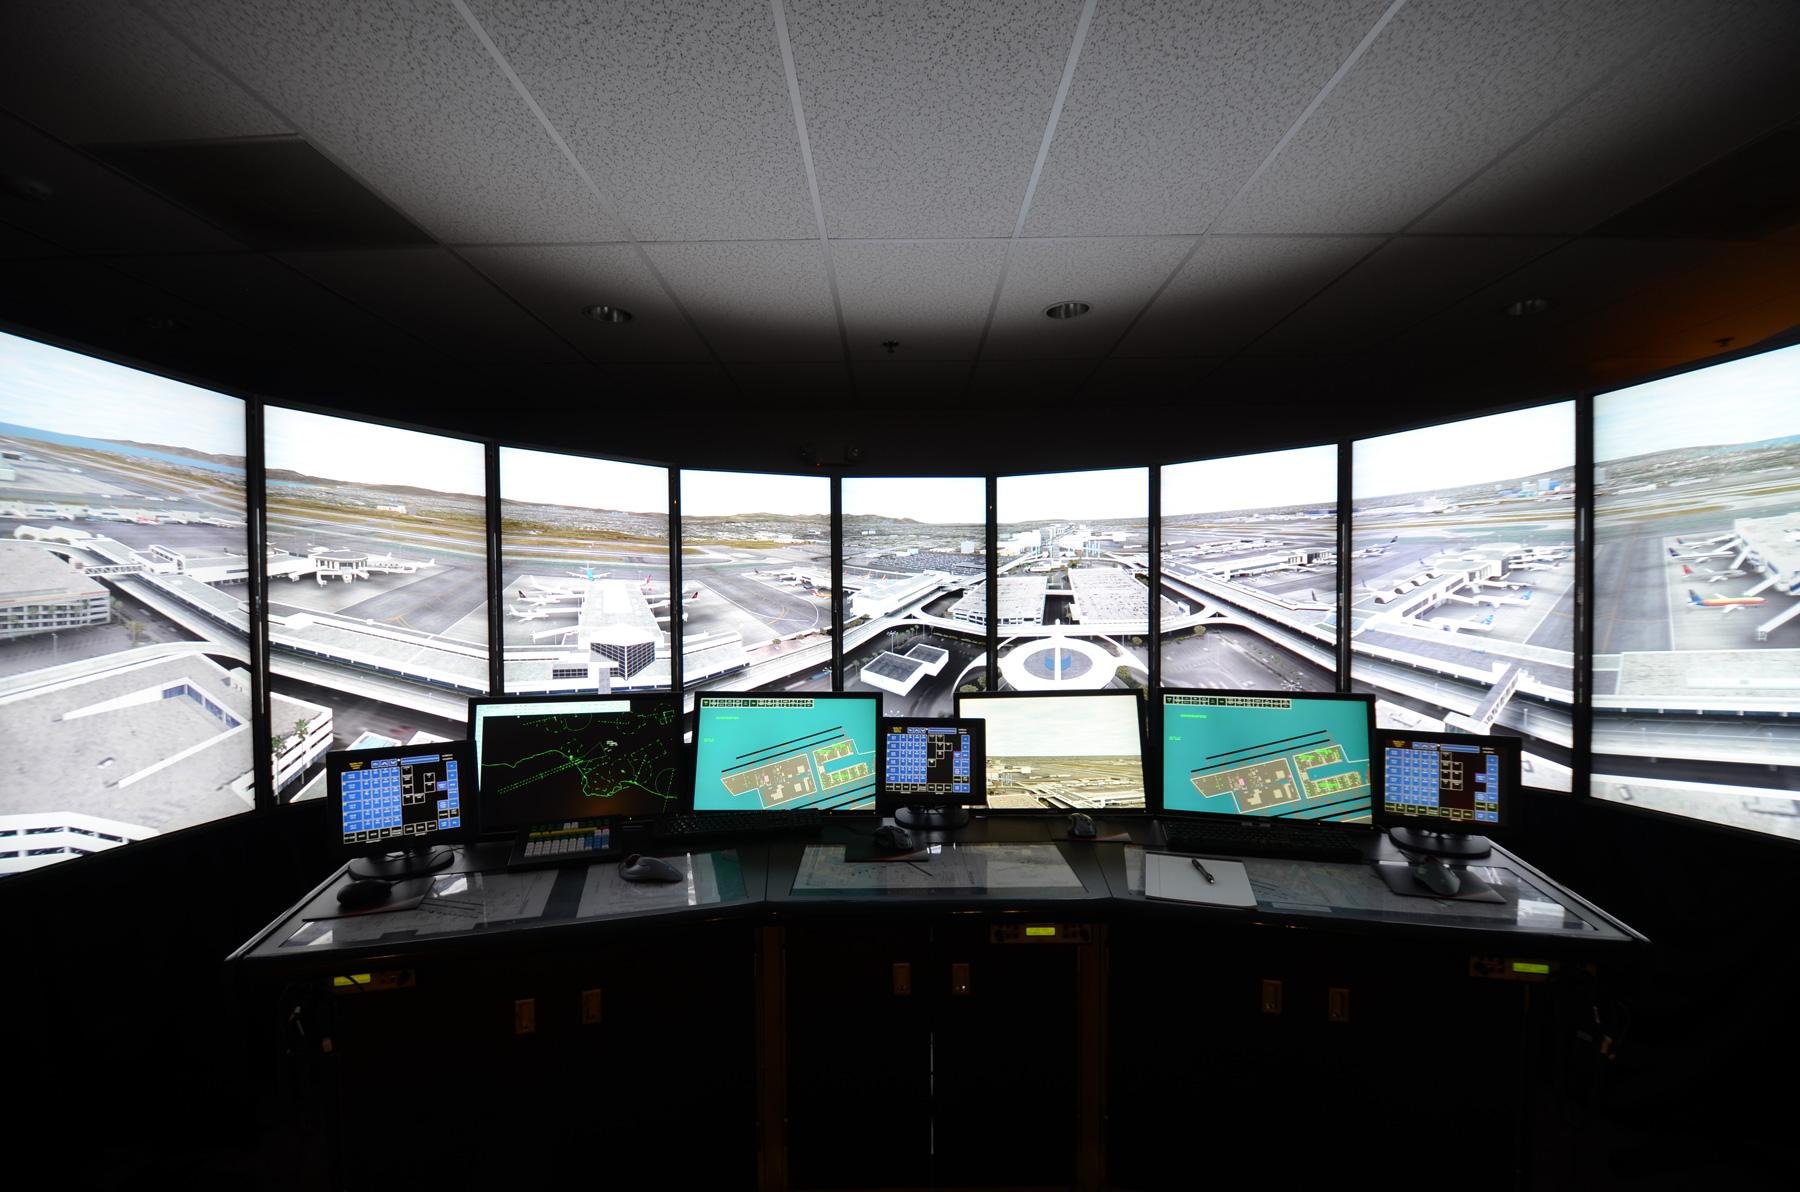 MaxSim ATC photo-like representation of airport